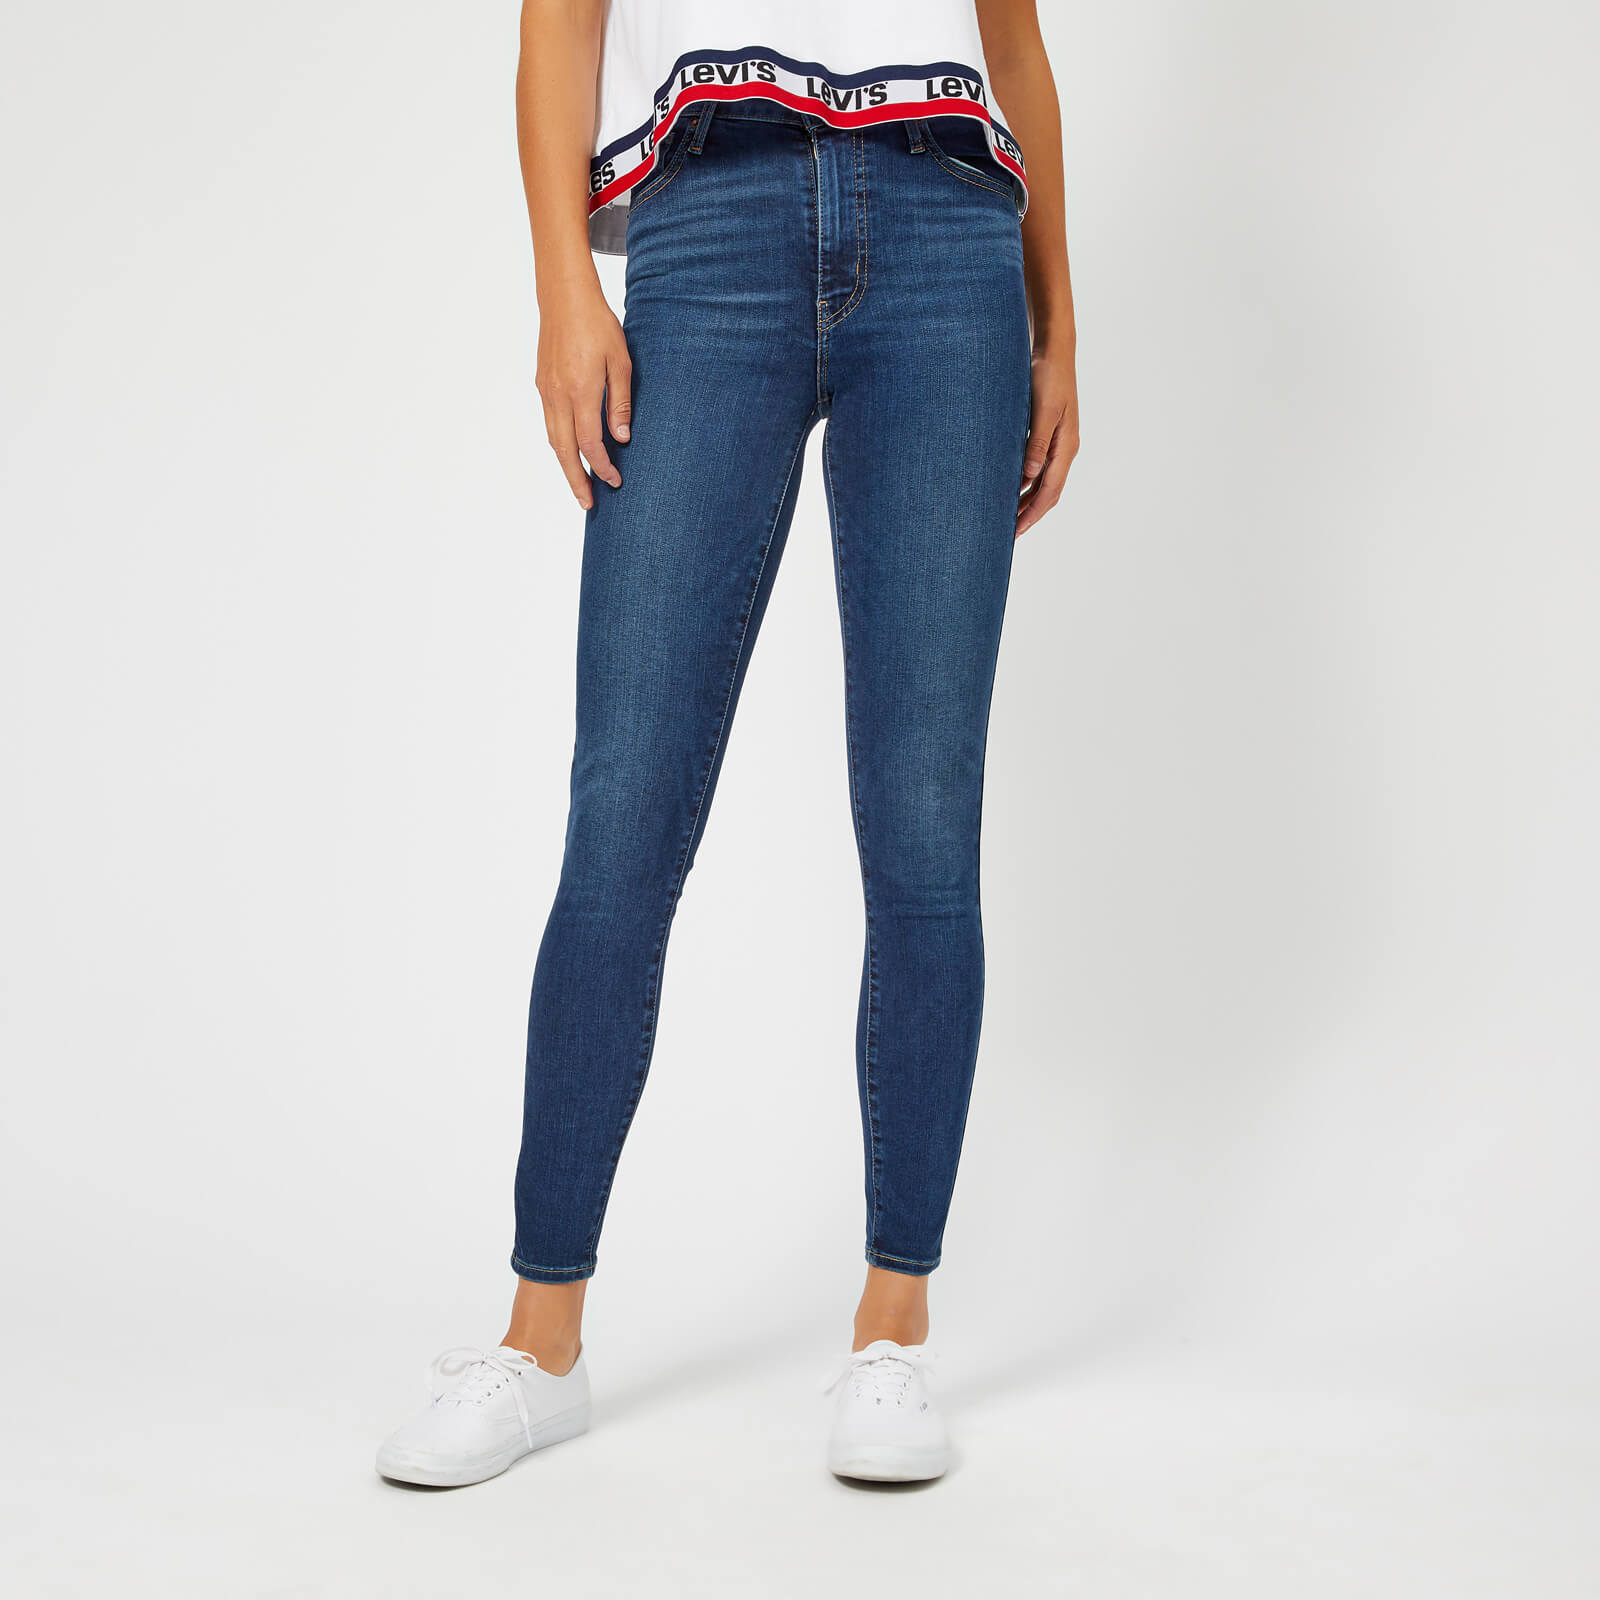 fbfe86ed Levi's Women's Mile High Super Skinny Jeans - Breakthrough Blue Clothing |  TheHut.com